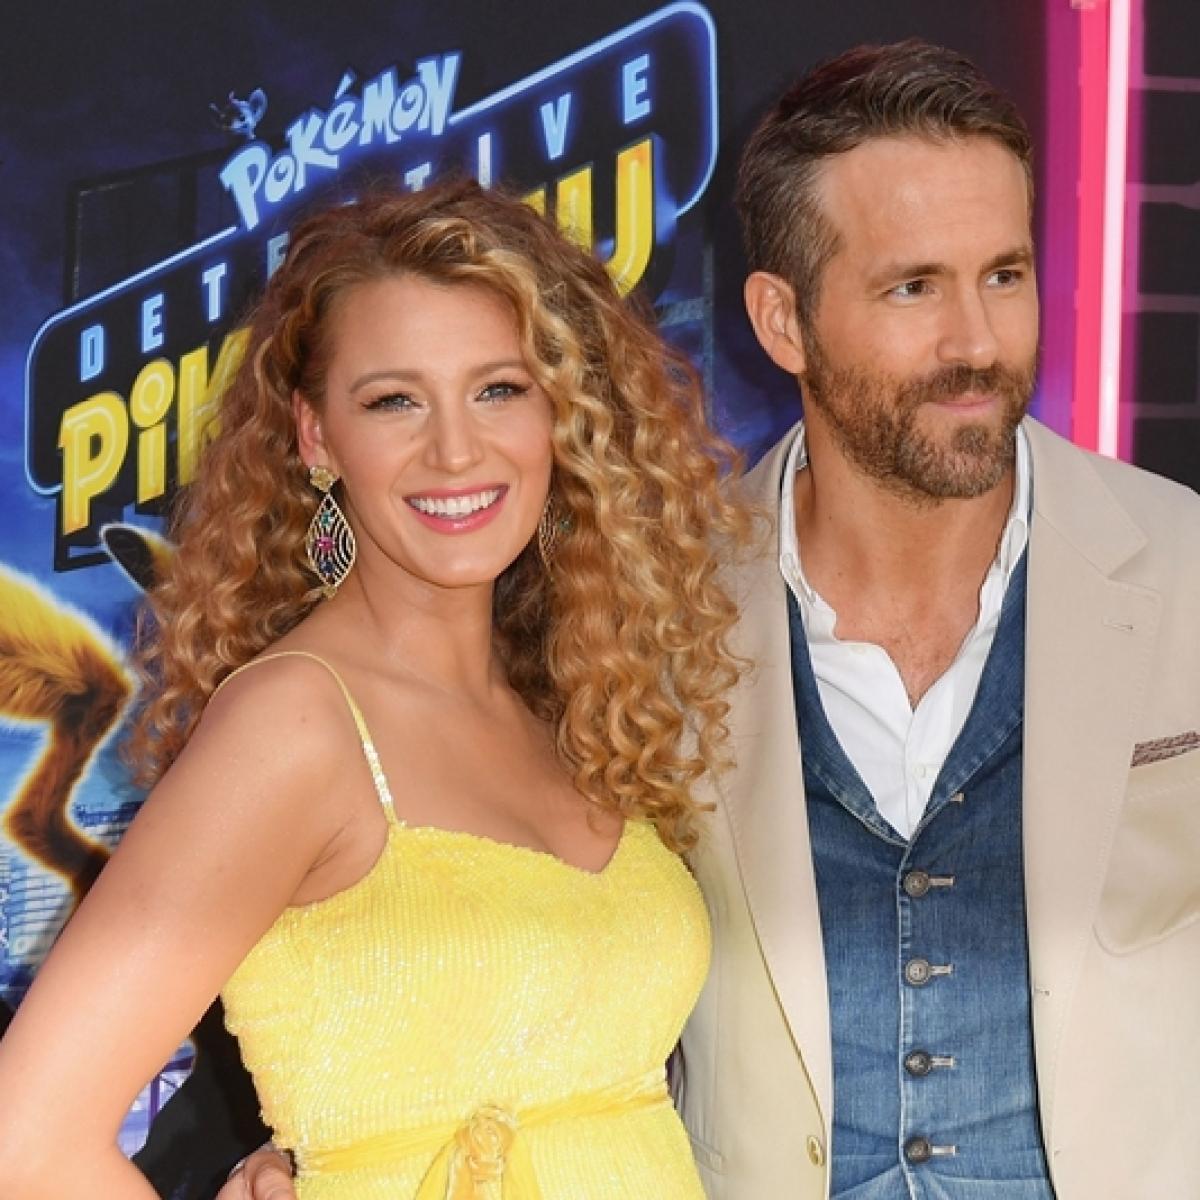 Coronavirus: Ryan Reynolds, Blake Lively donate USD 1 million to hunger relief funds